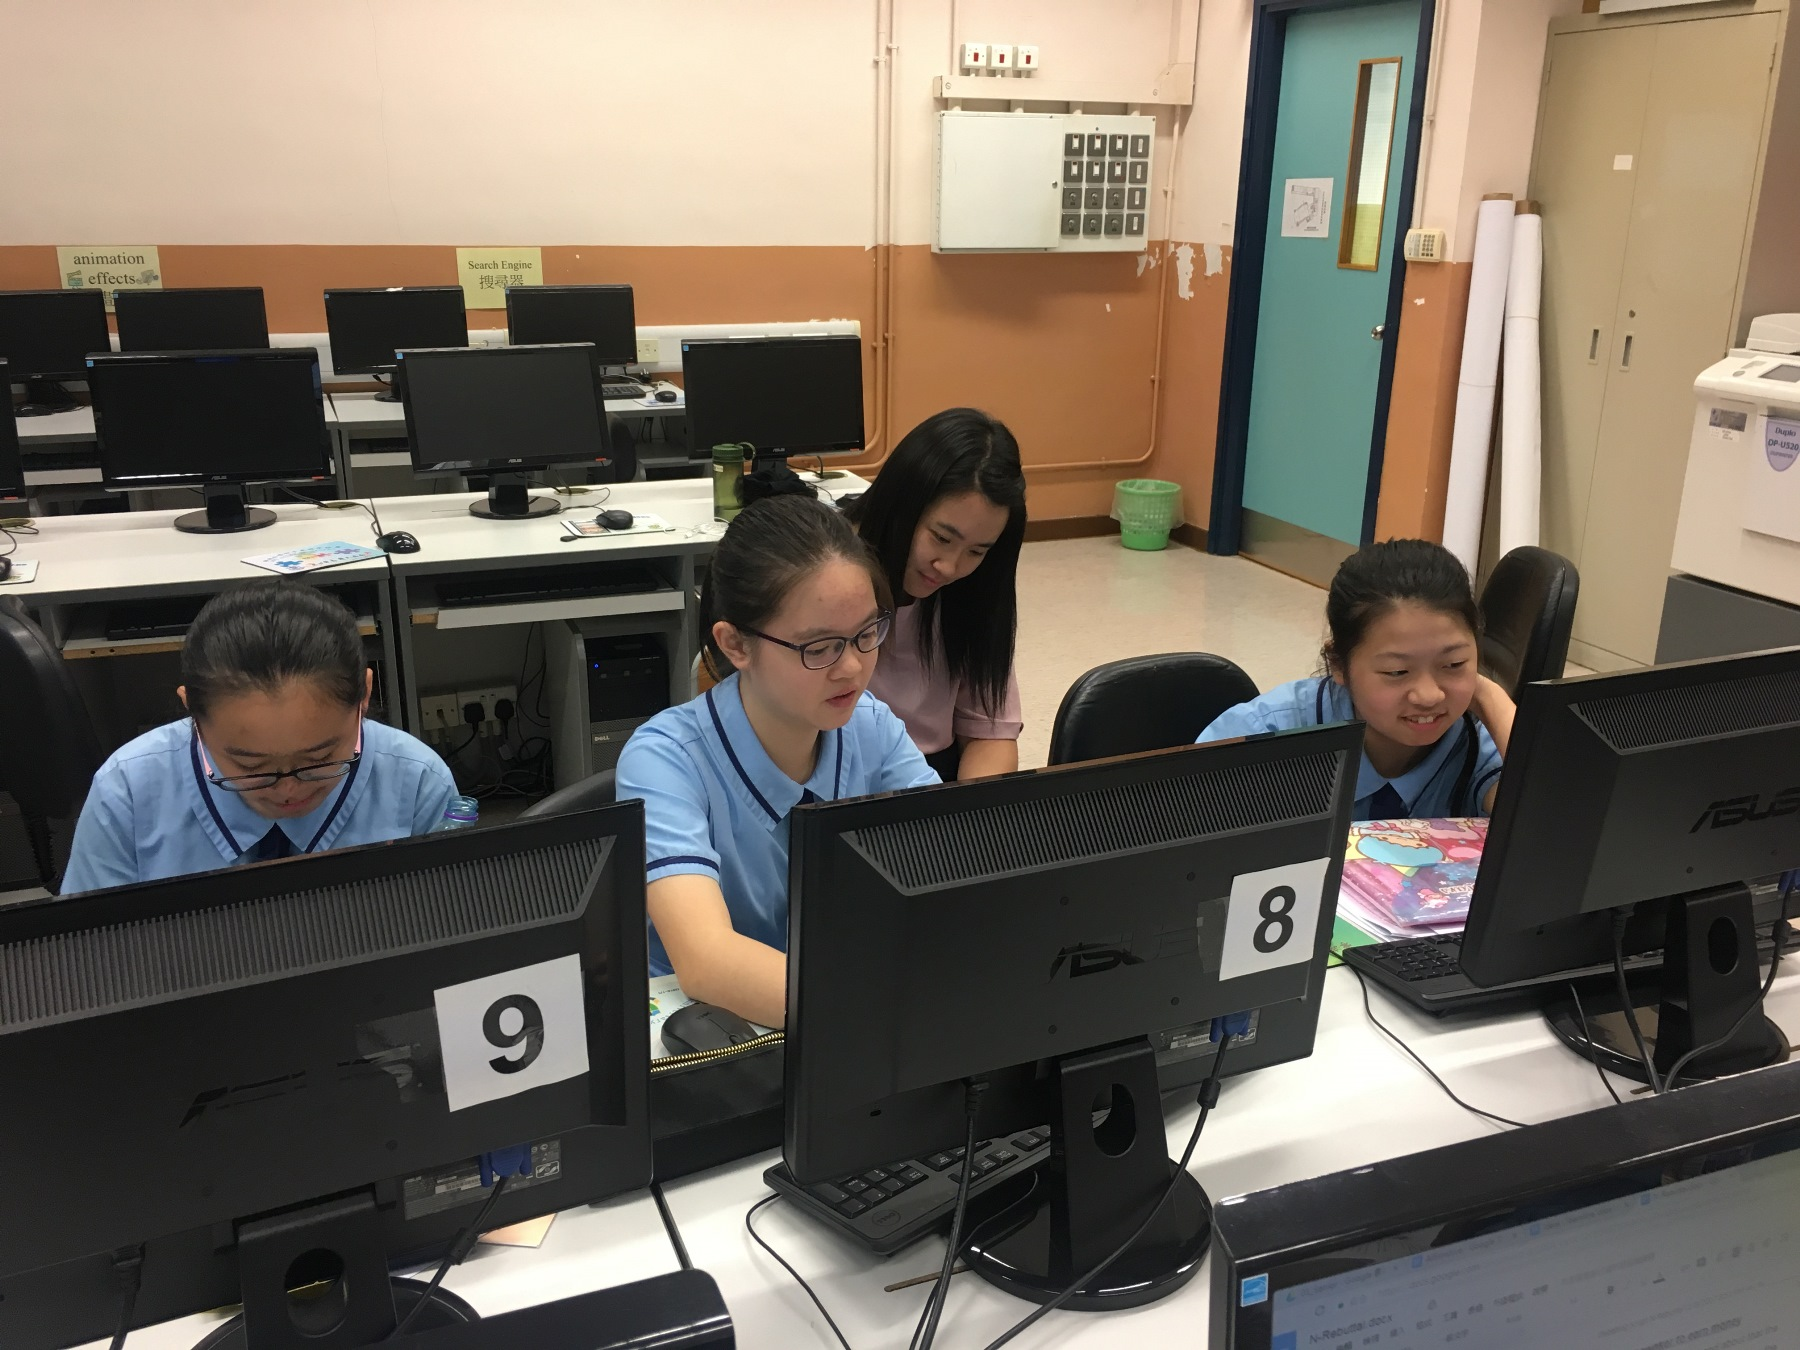 http://npc.edu.hk/sites/default/files/img_2987.jpg